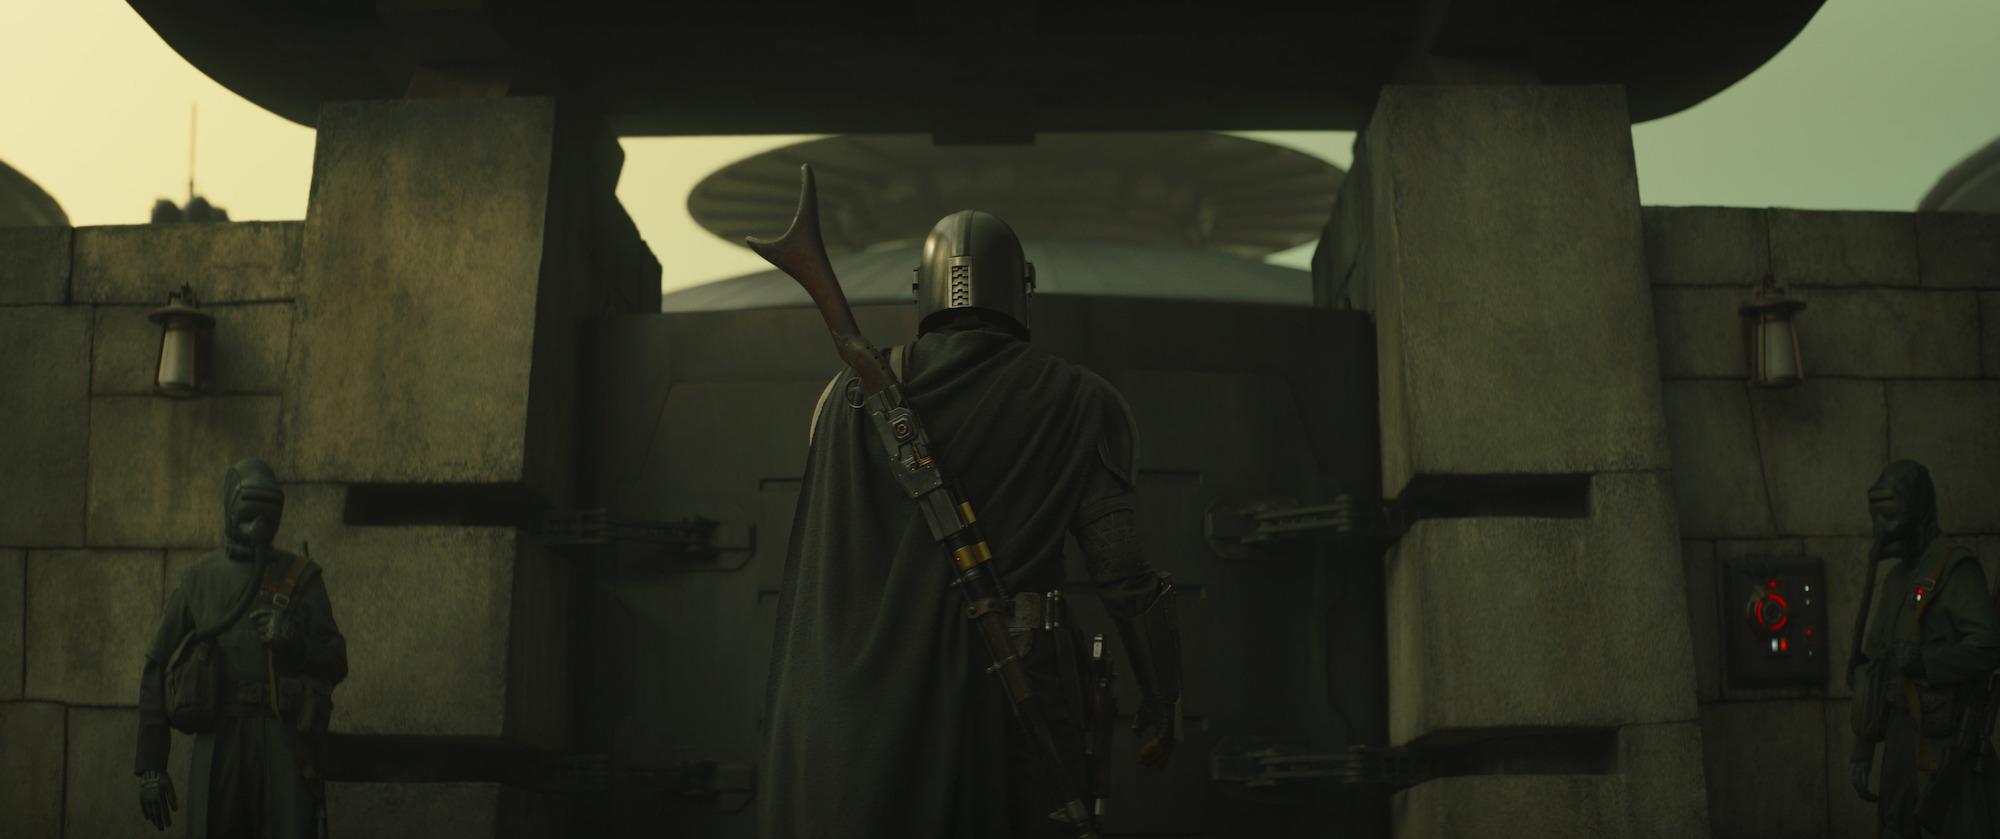 Mando, Din Djarin, in Episode 5 of 'The Mandalorian' Season 2